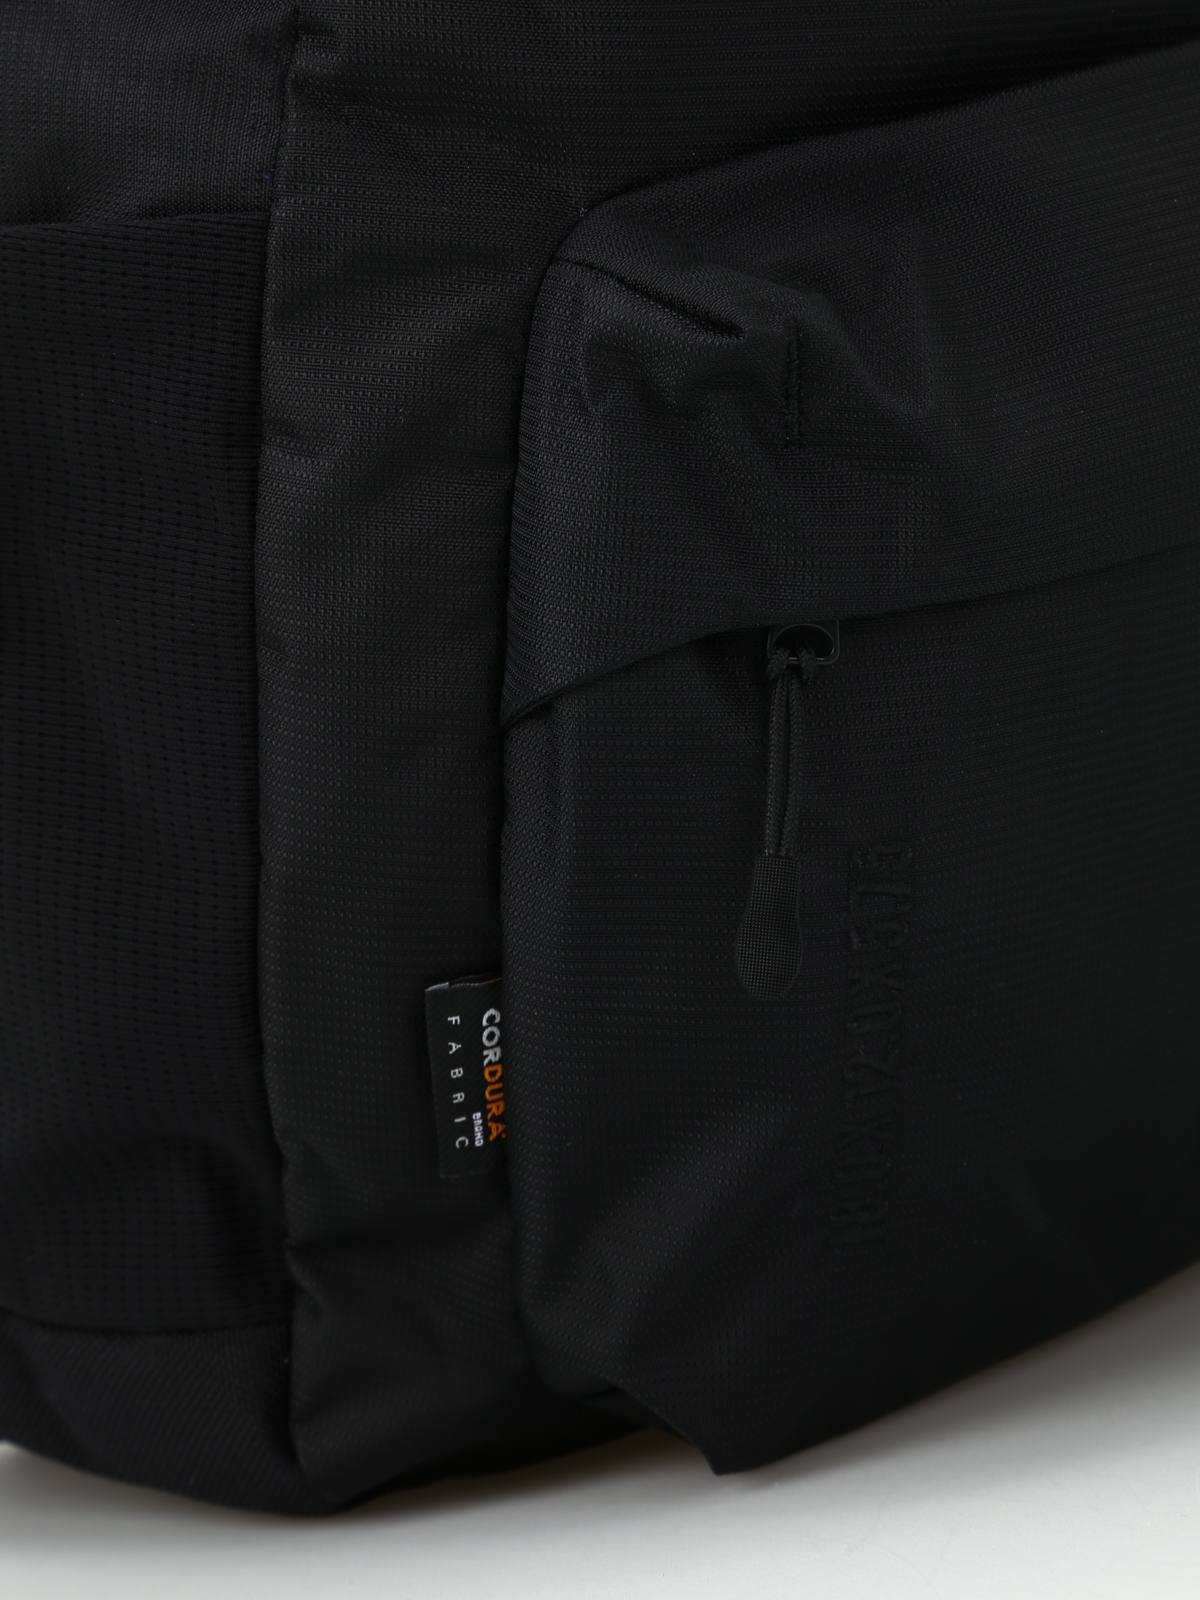 e6bbb2492 Herschel - Rundle black waterproof backpack - backpacks - 1029801174OS